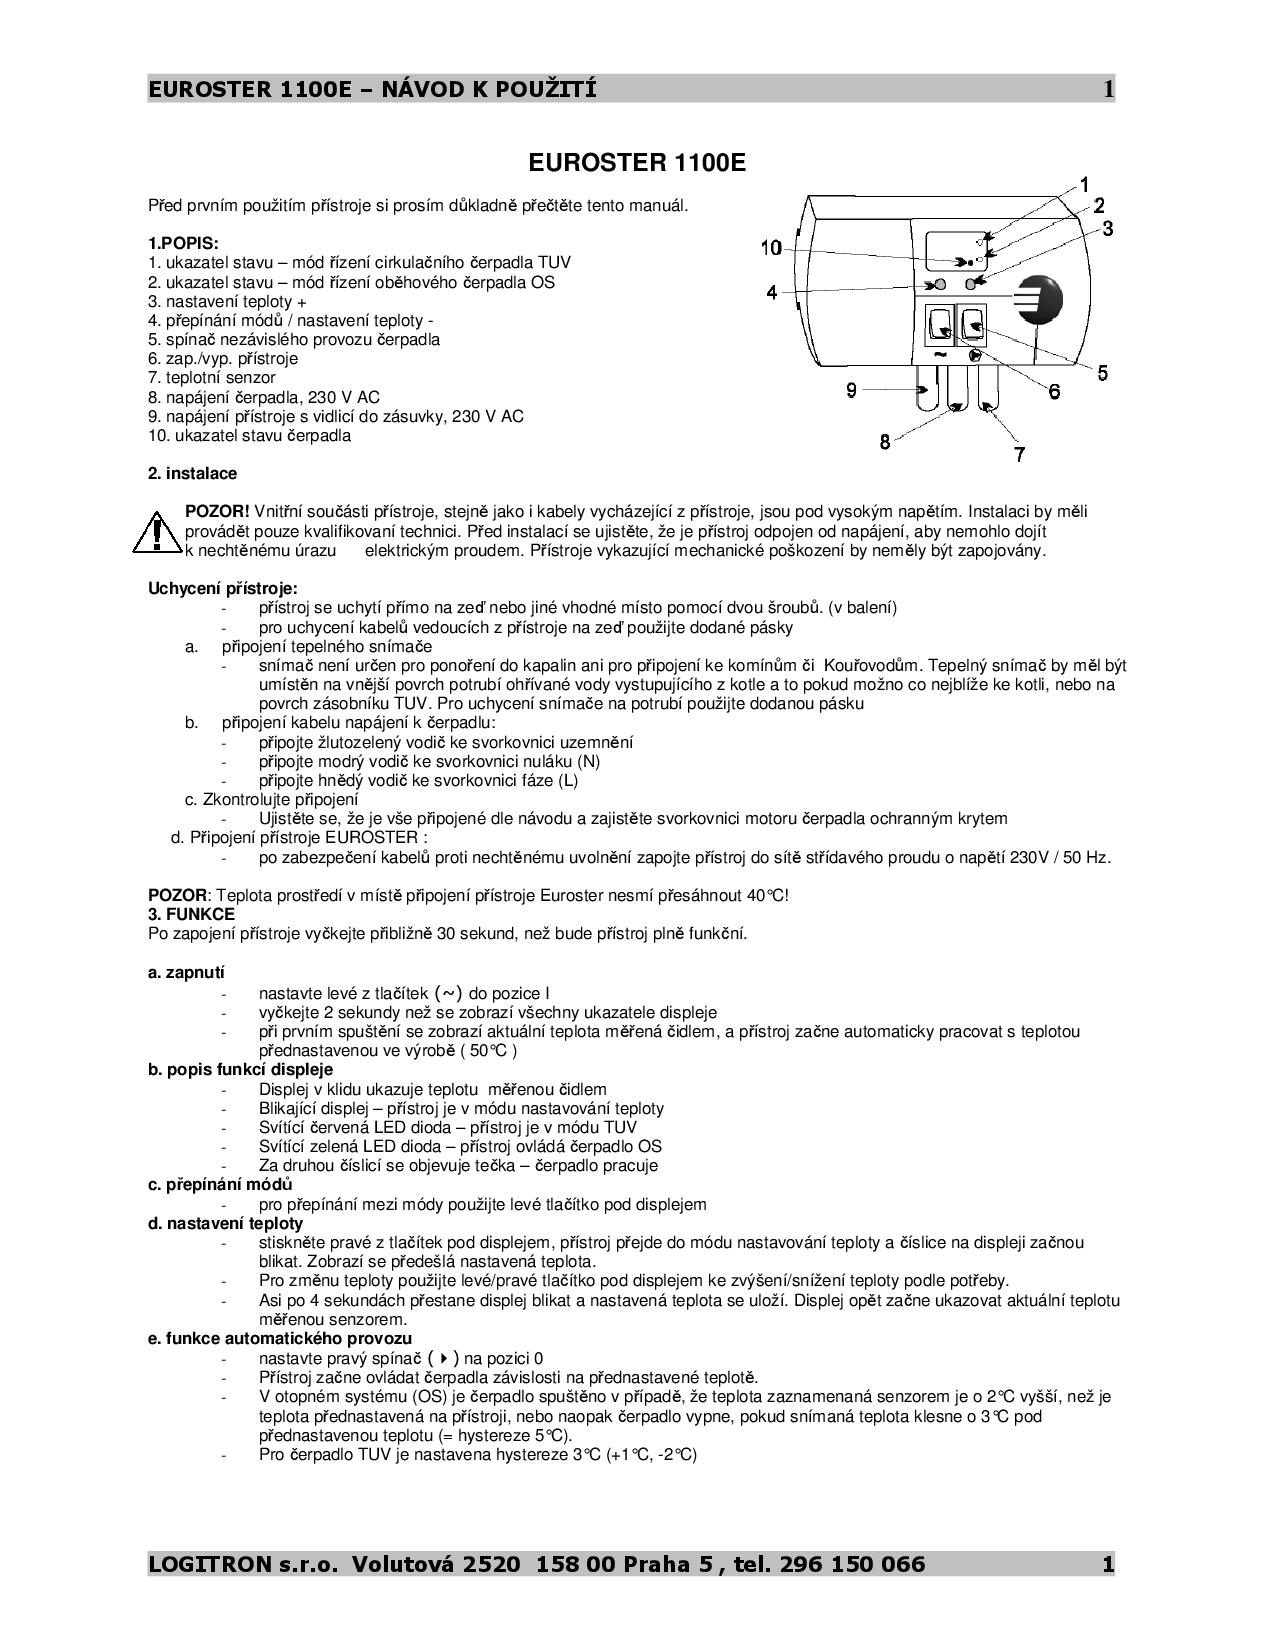 casio g shock 5229 manual